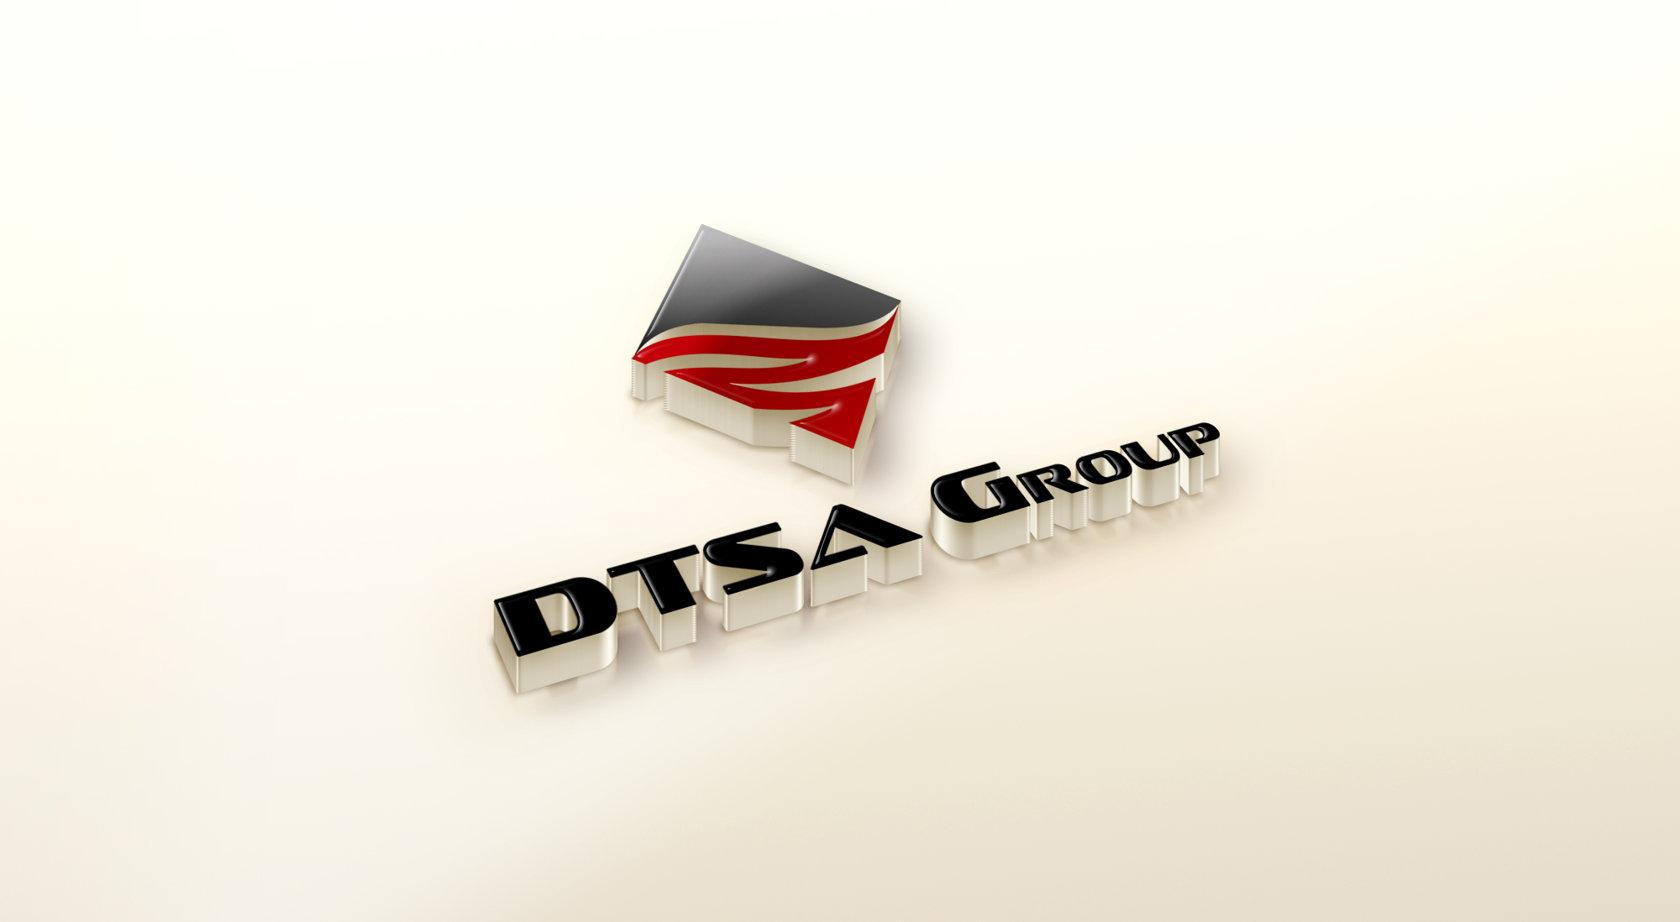 DTSA Group - торговля биткоинами через API